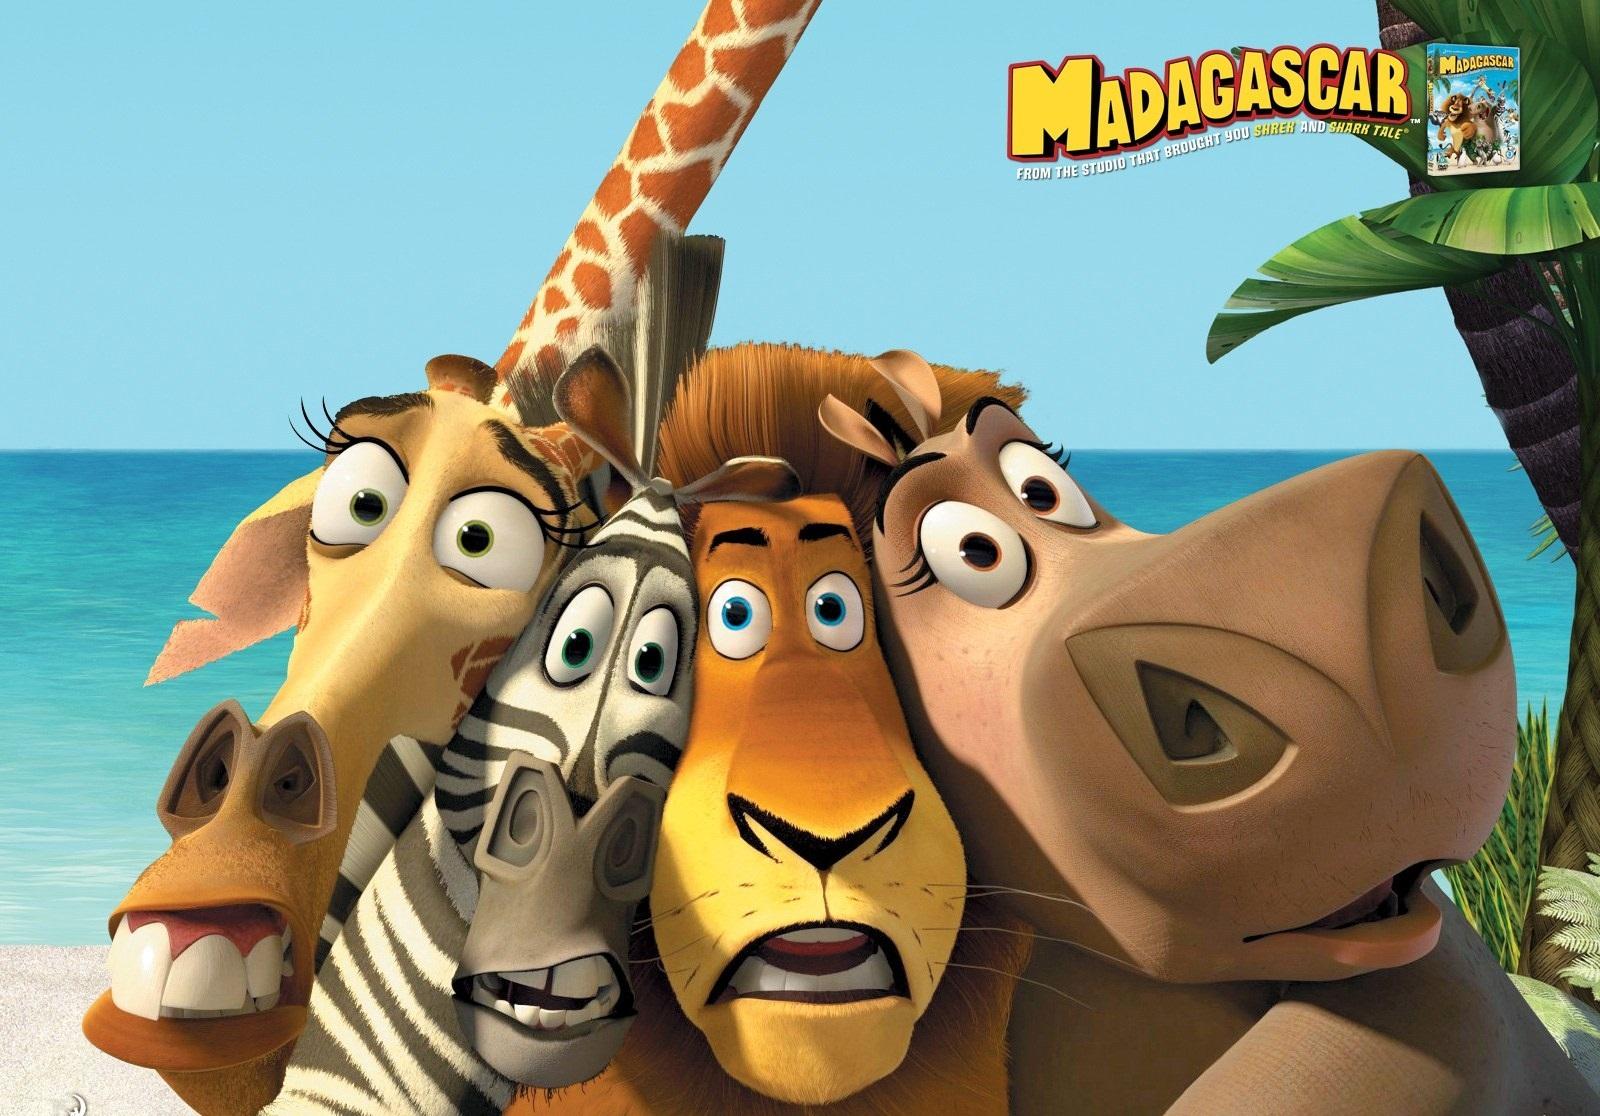 madagascar 3 movie characters - photo #19